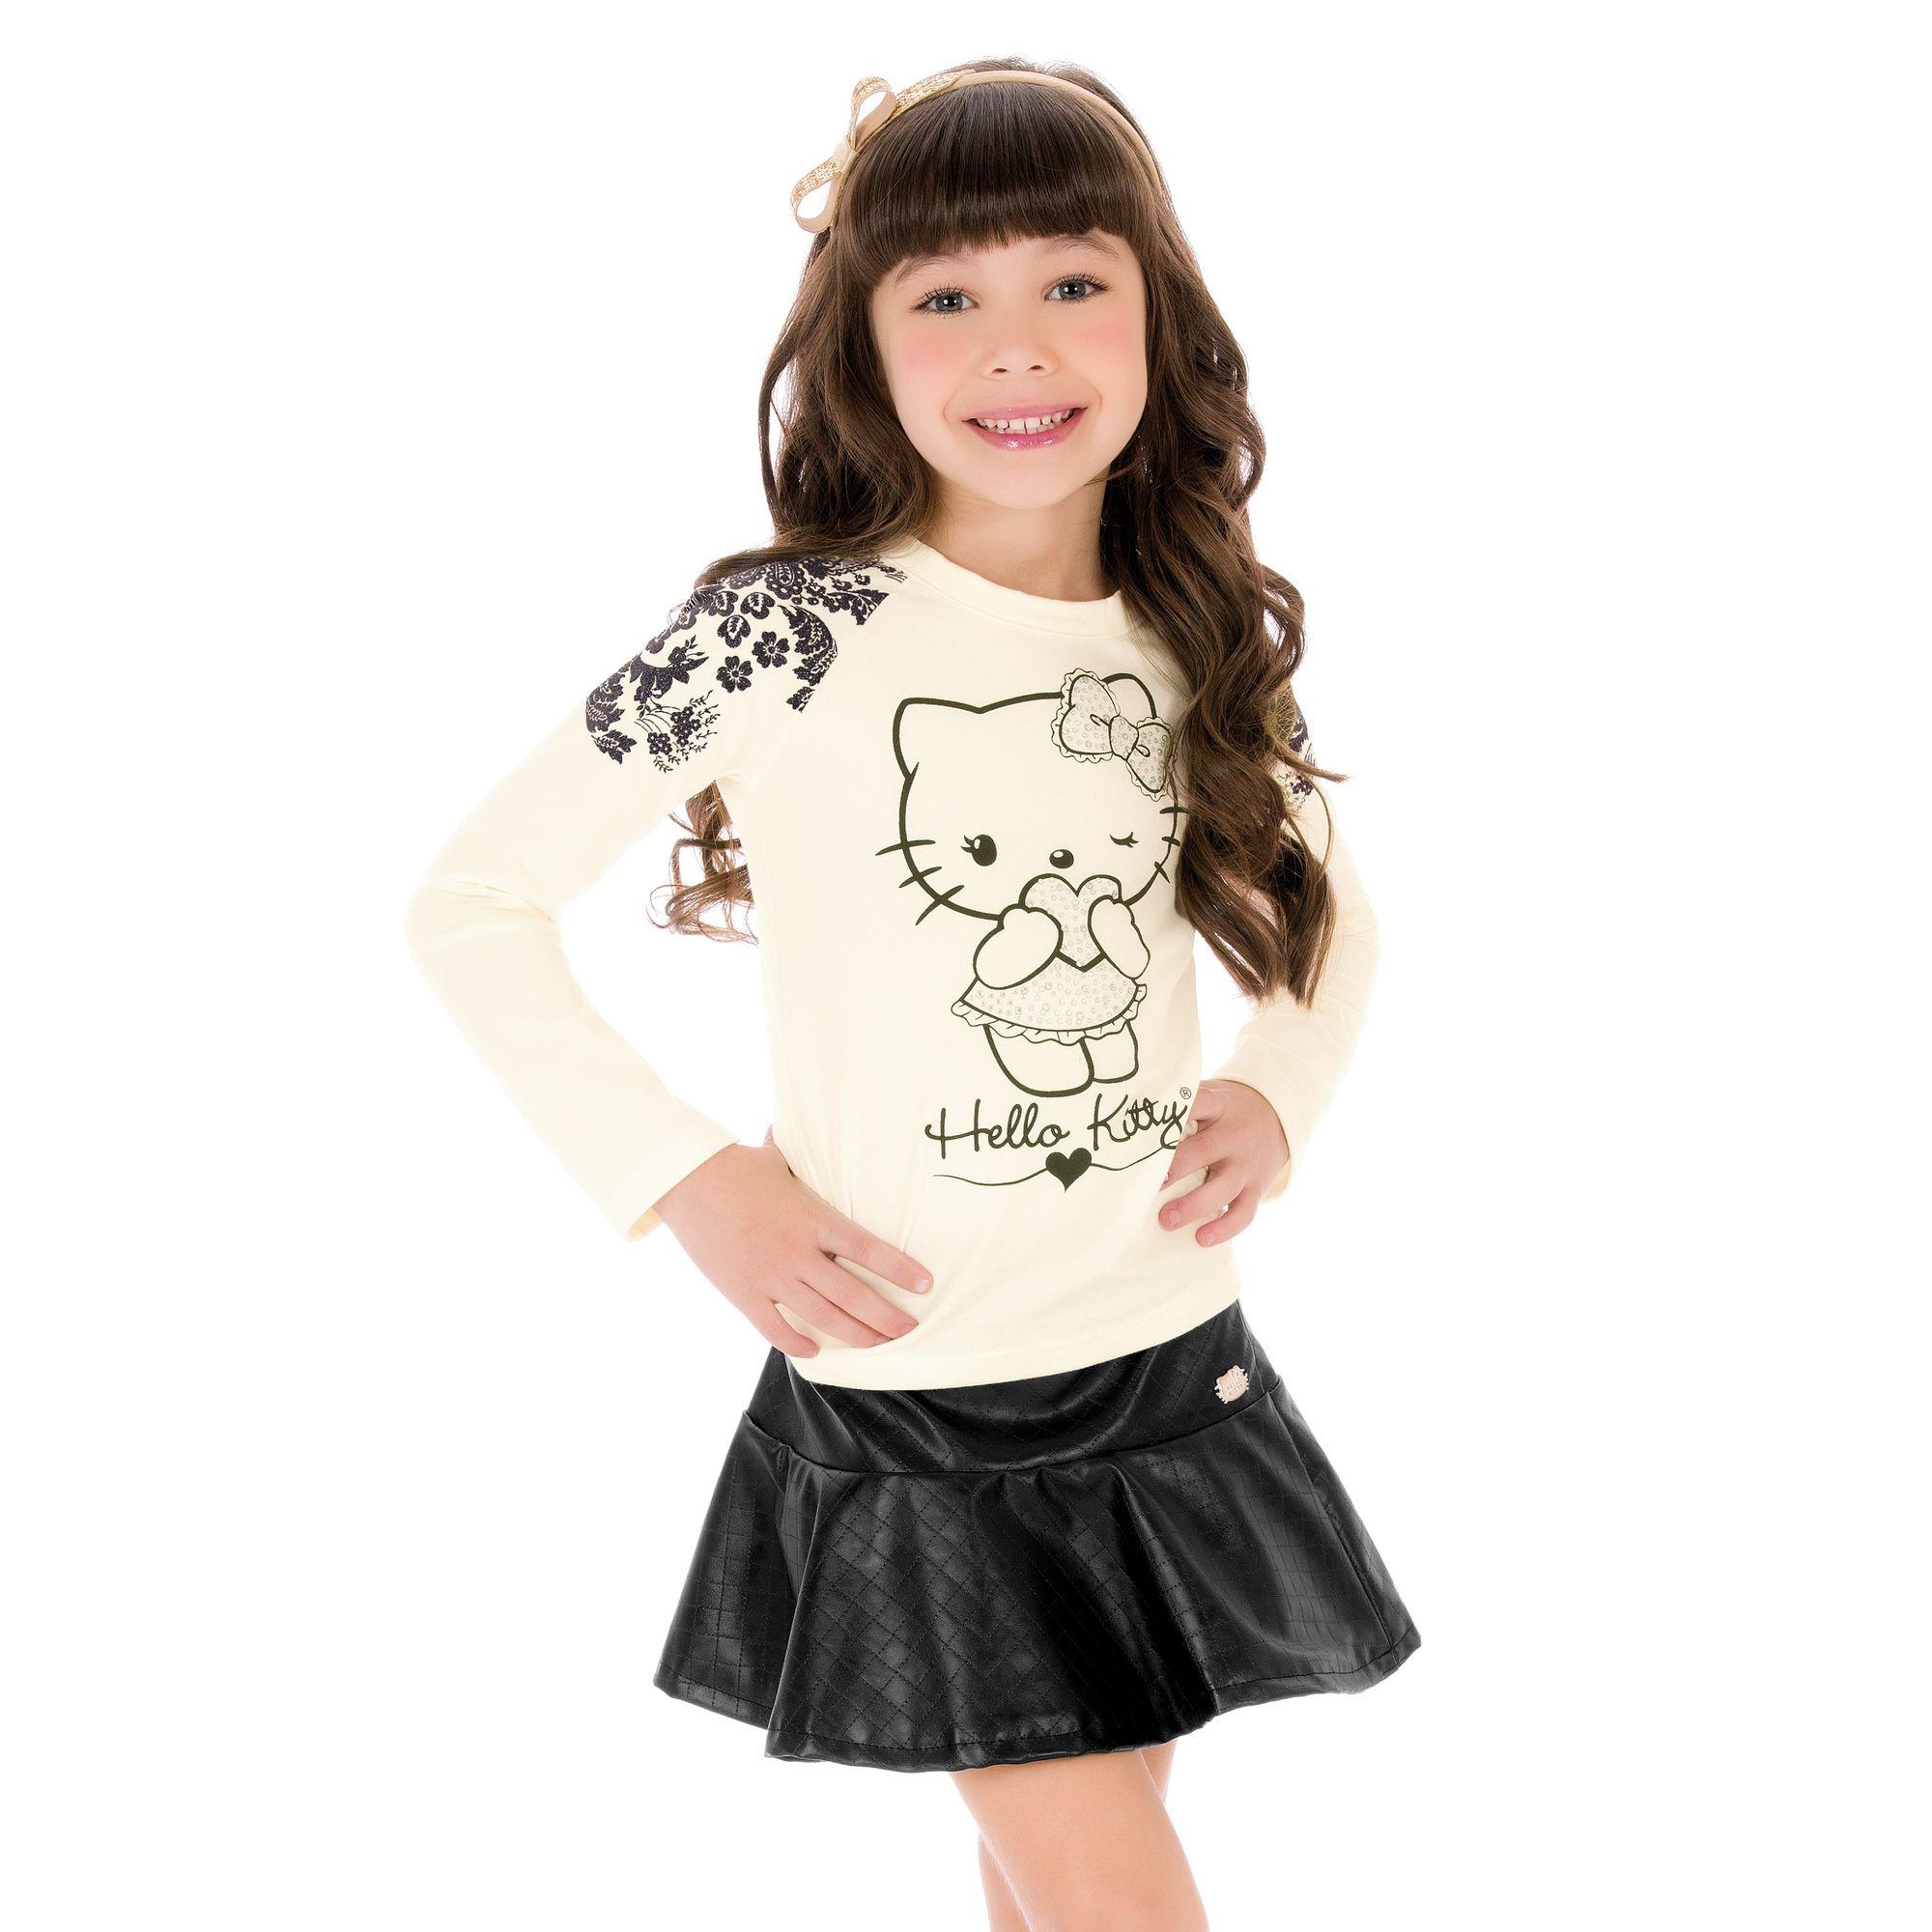 cafef2653 Camiseta Manga Longa Branca e Preta e Saia Corino Rodada Hello Kitty -  Roupa para Menina é na EcaMeleca Kids - EcaMeleca